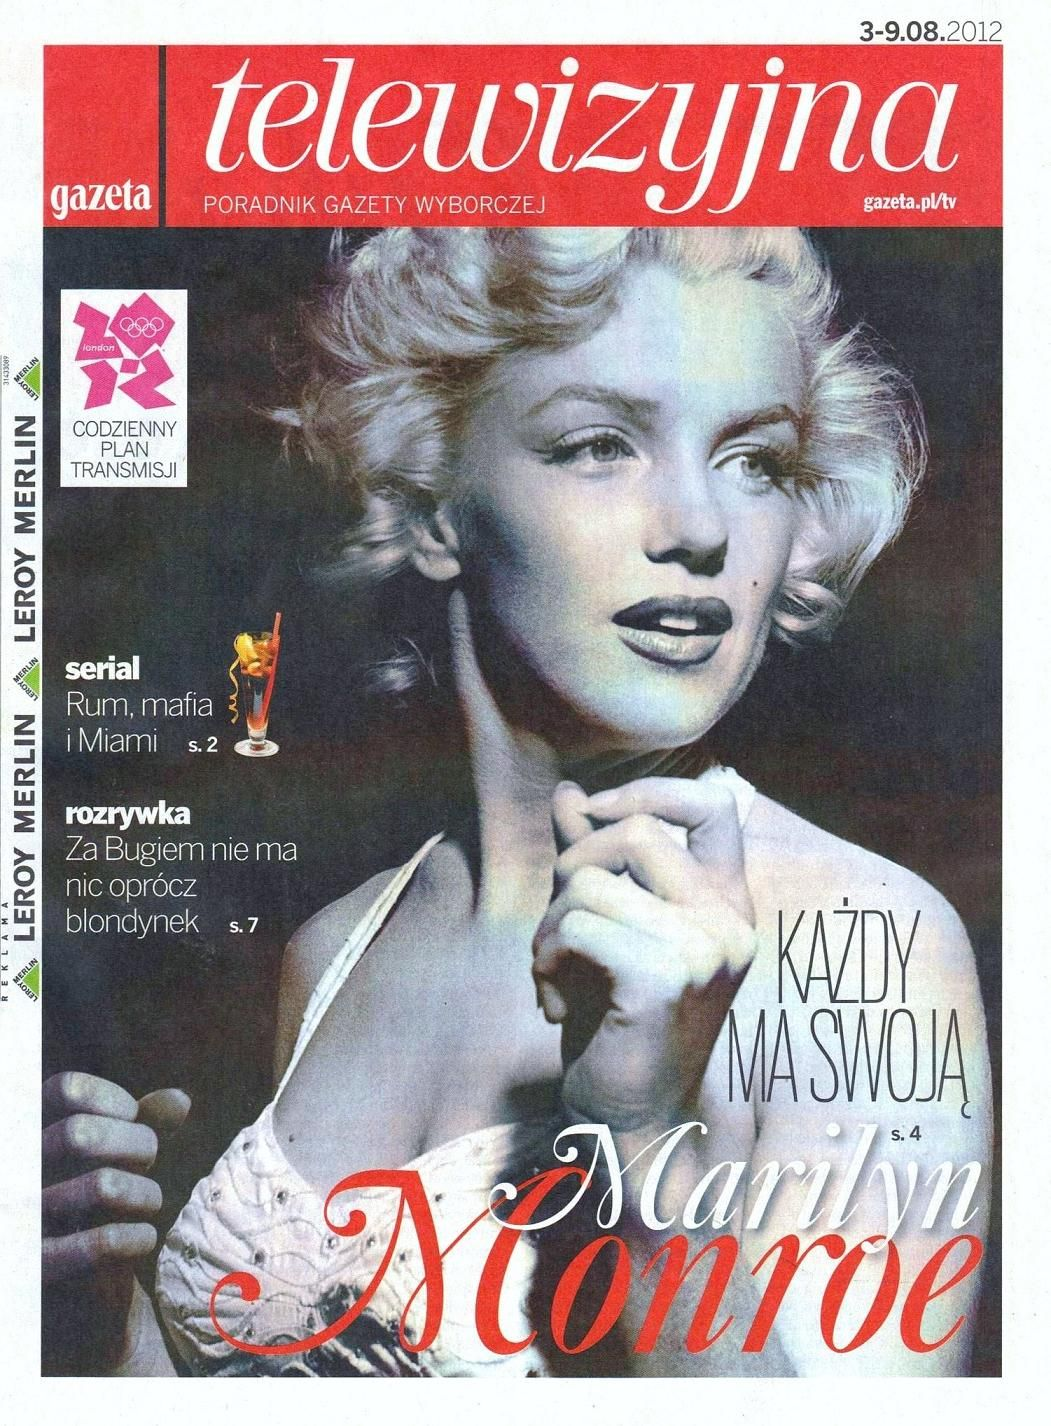 2012-08-03-telewizyjna-pologne-1